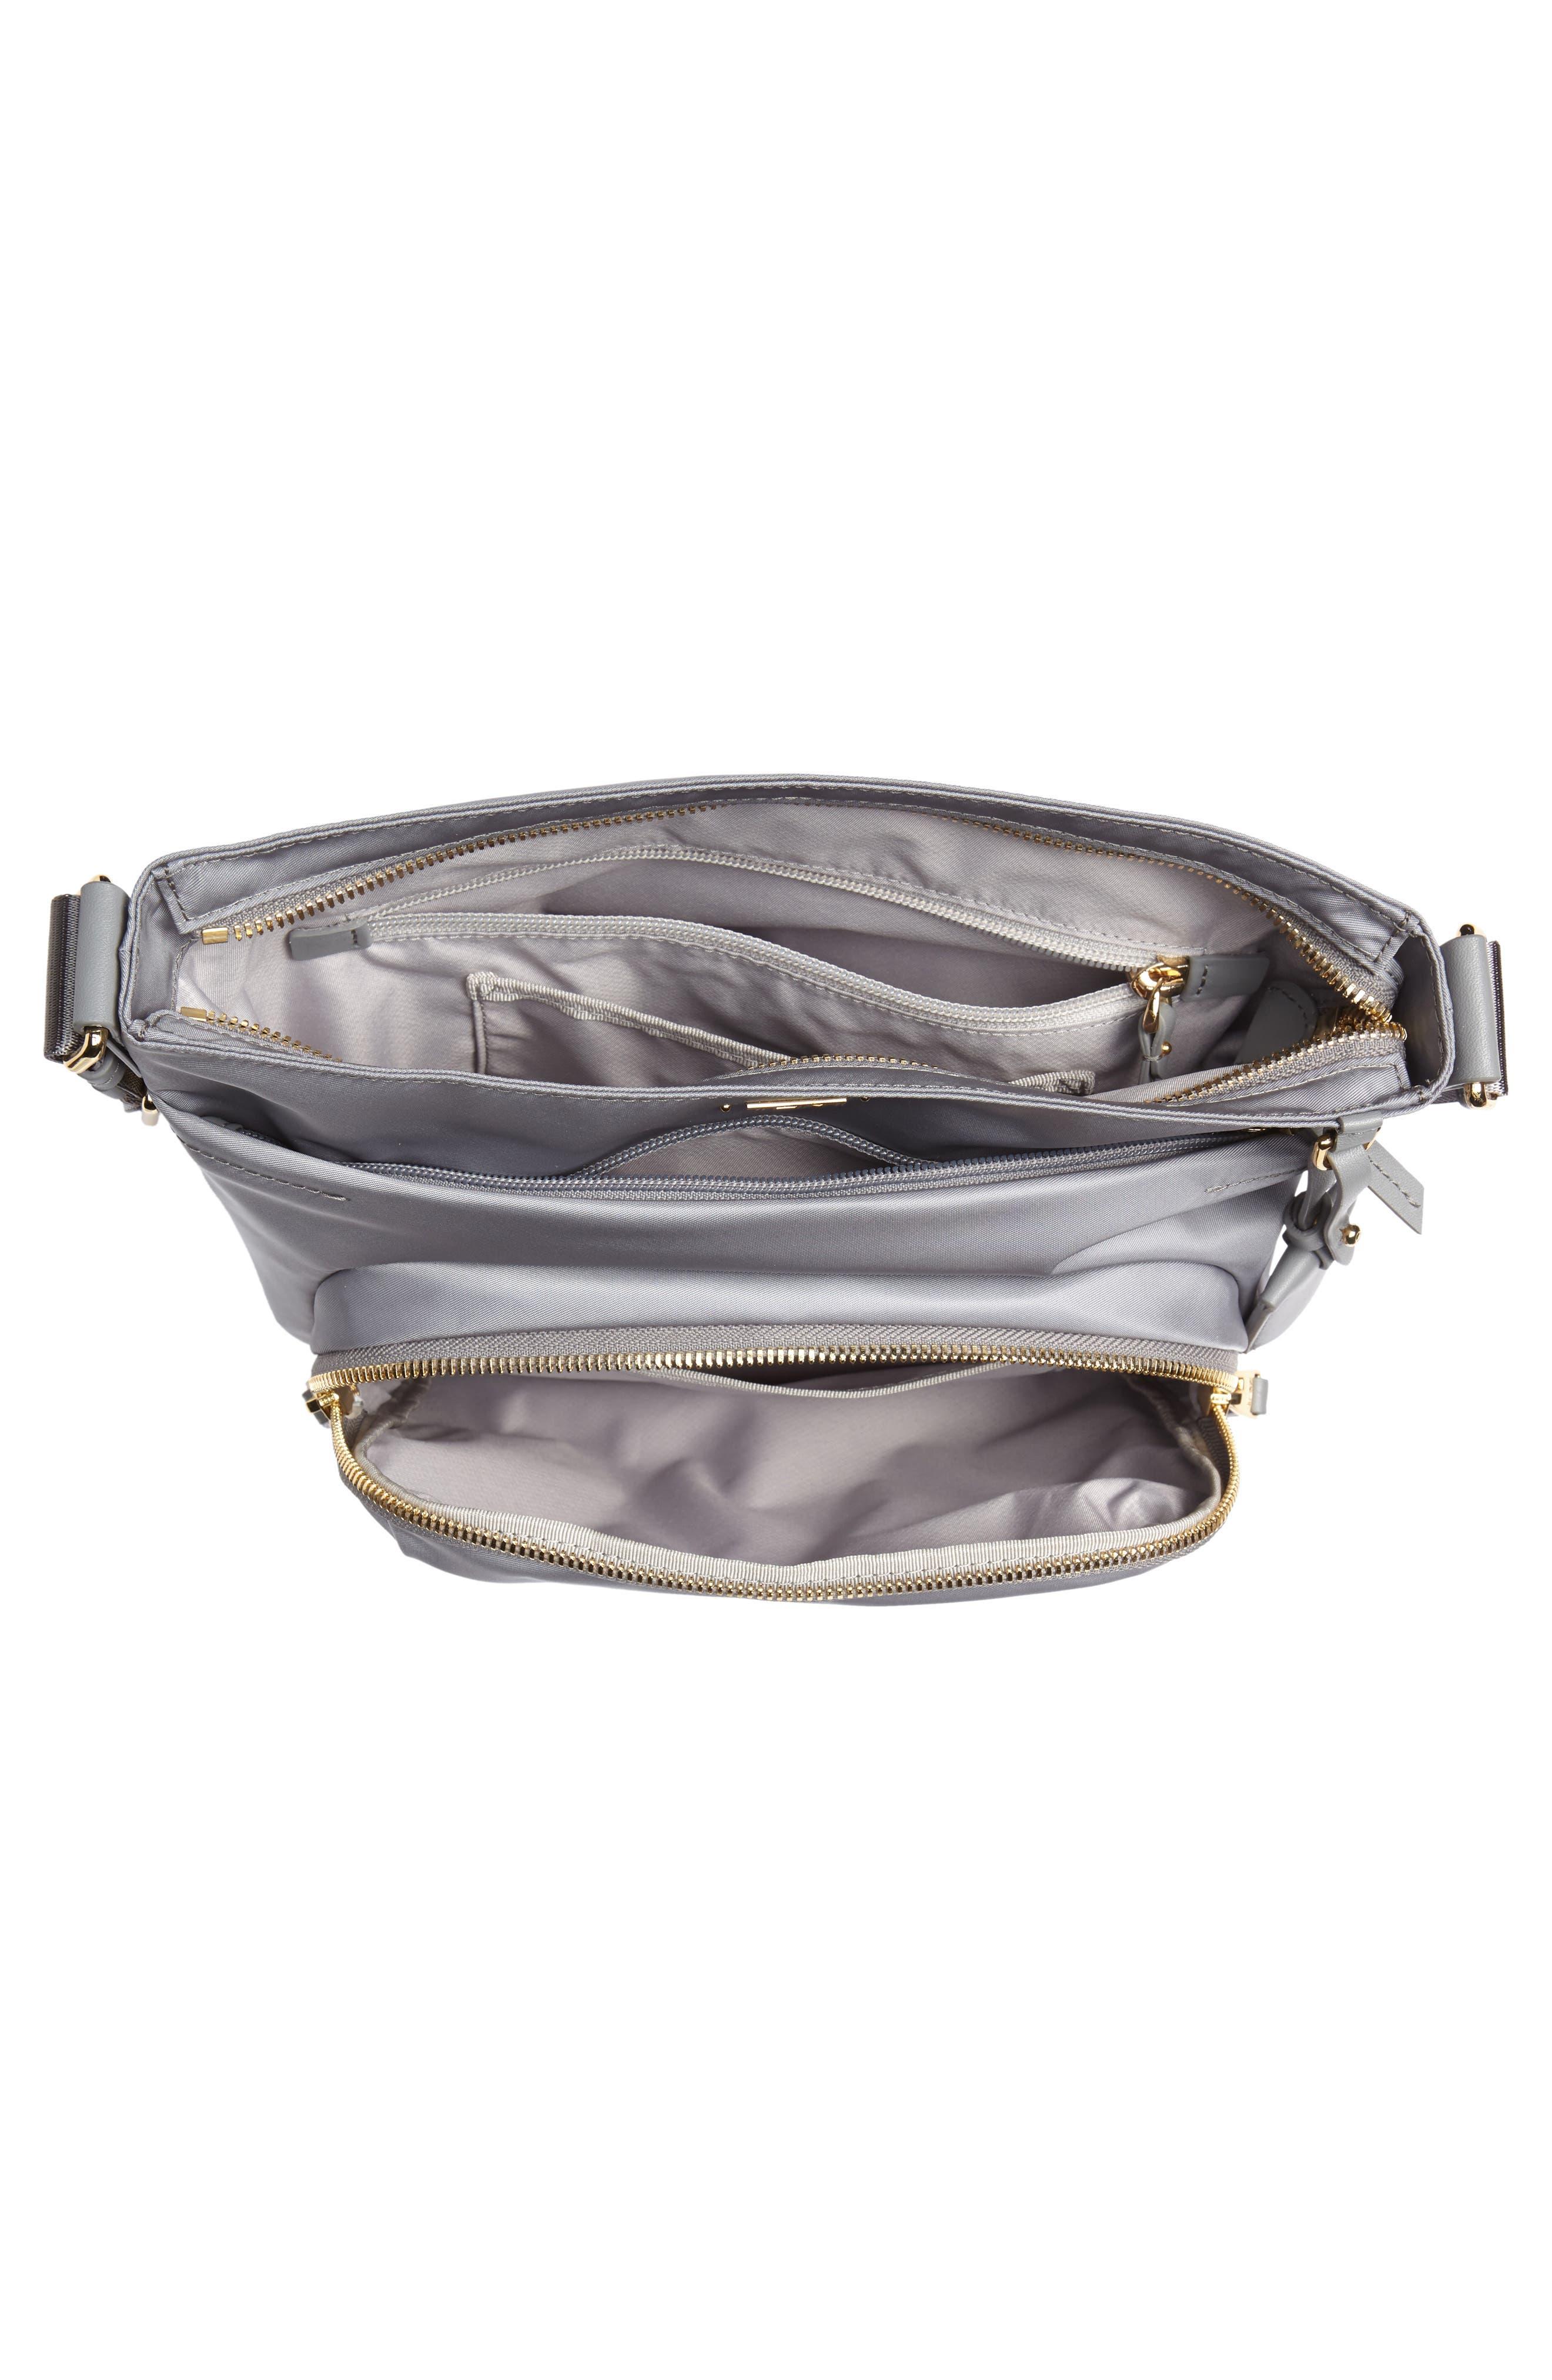 Voyager - Capri Nylon Crossbody Bag,                             Alternate thumbnail 4, color,                             020